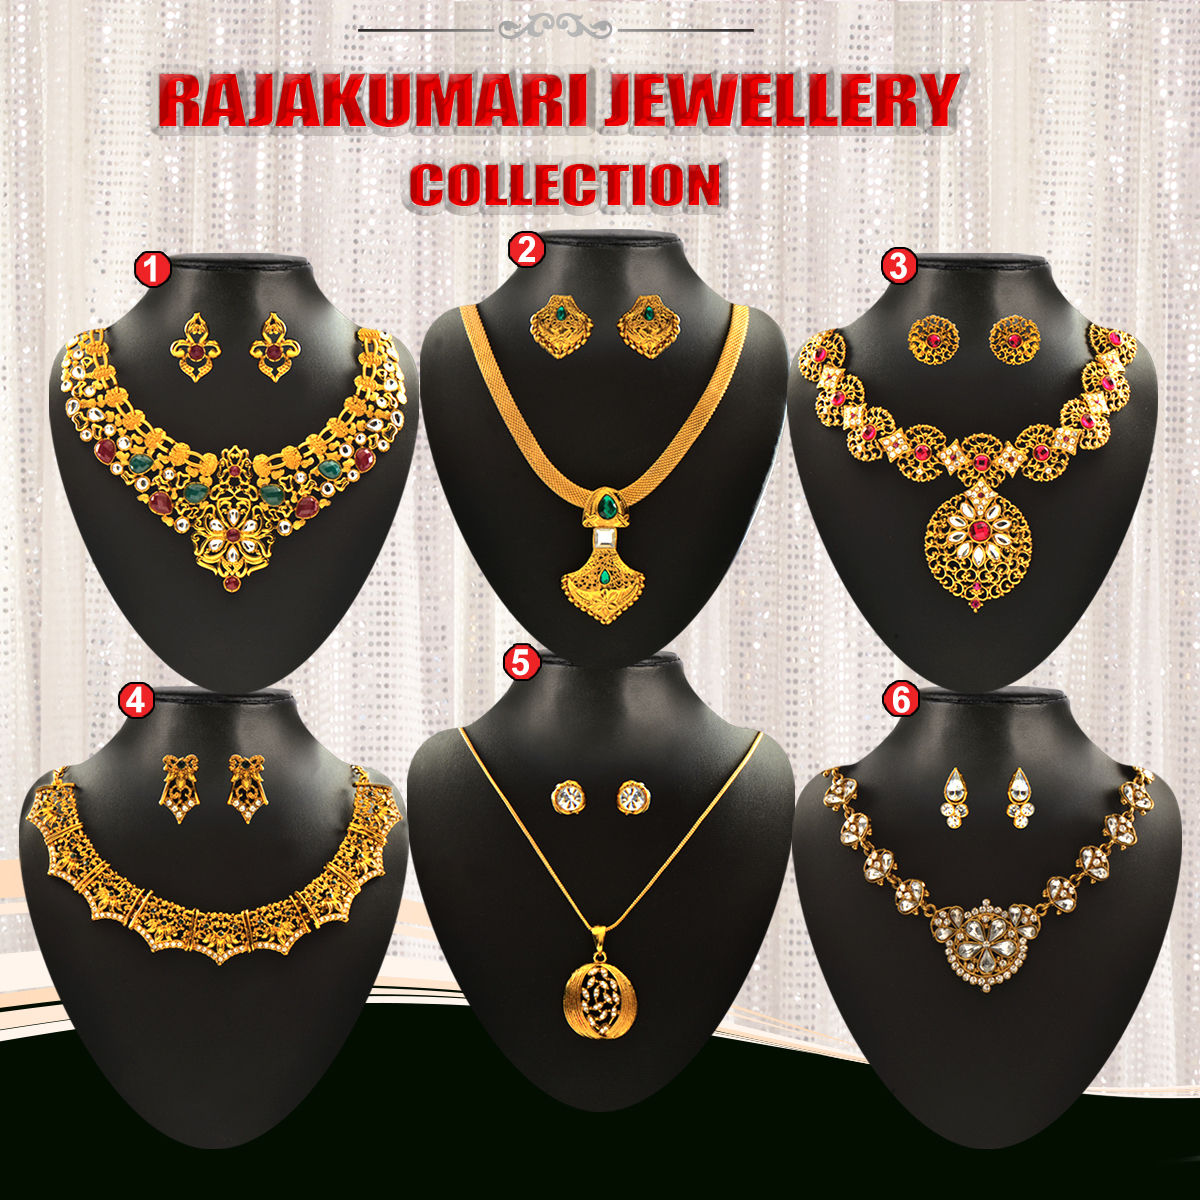 24710136d Buy Rajakumari Jewellery Collection Online at Best Price in India on  Naaptol.com